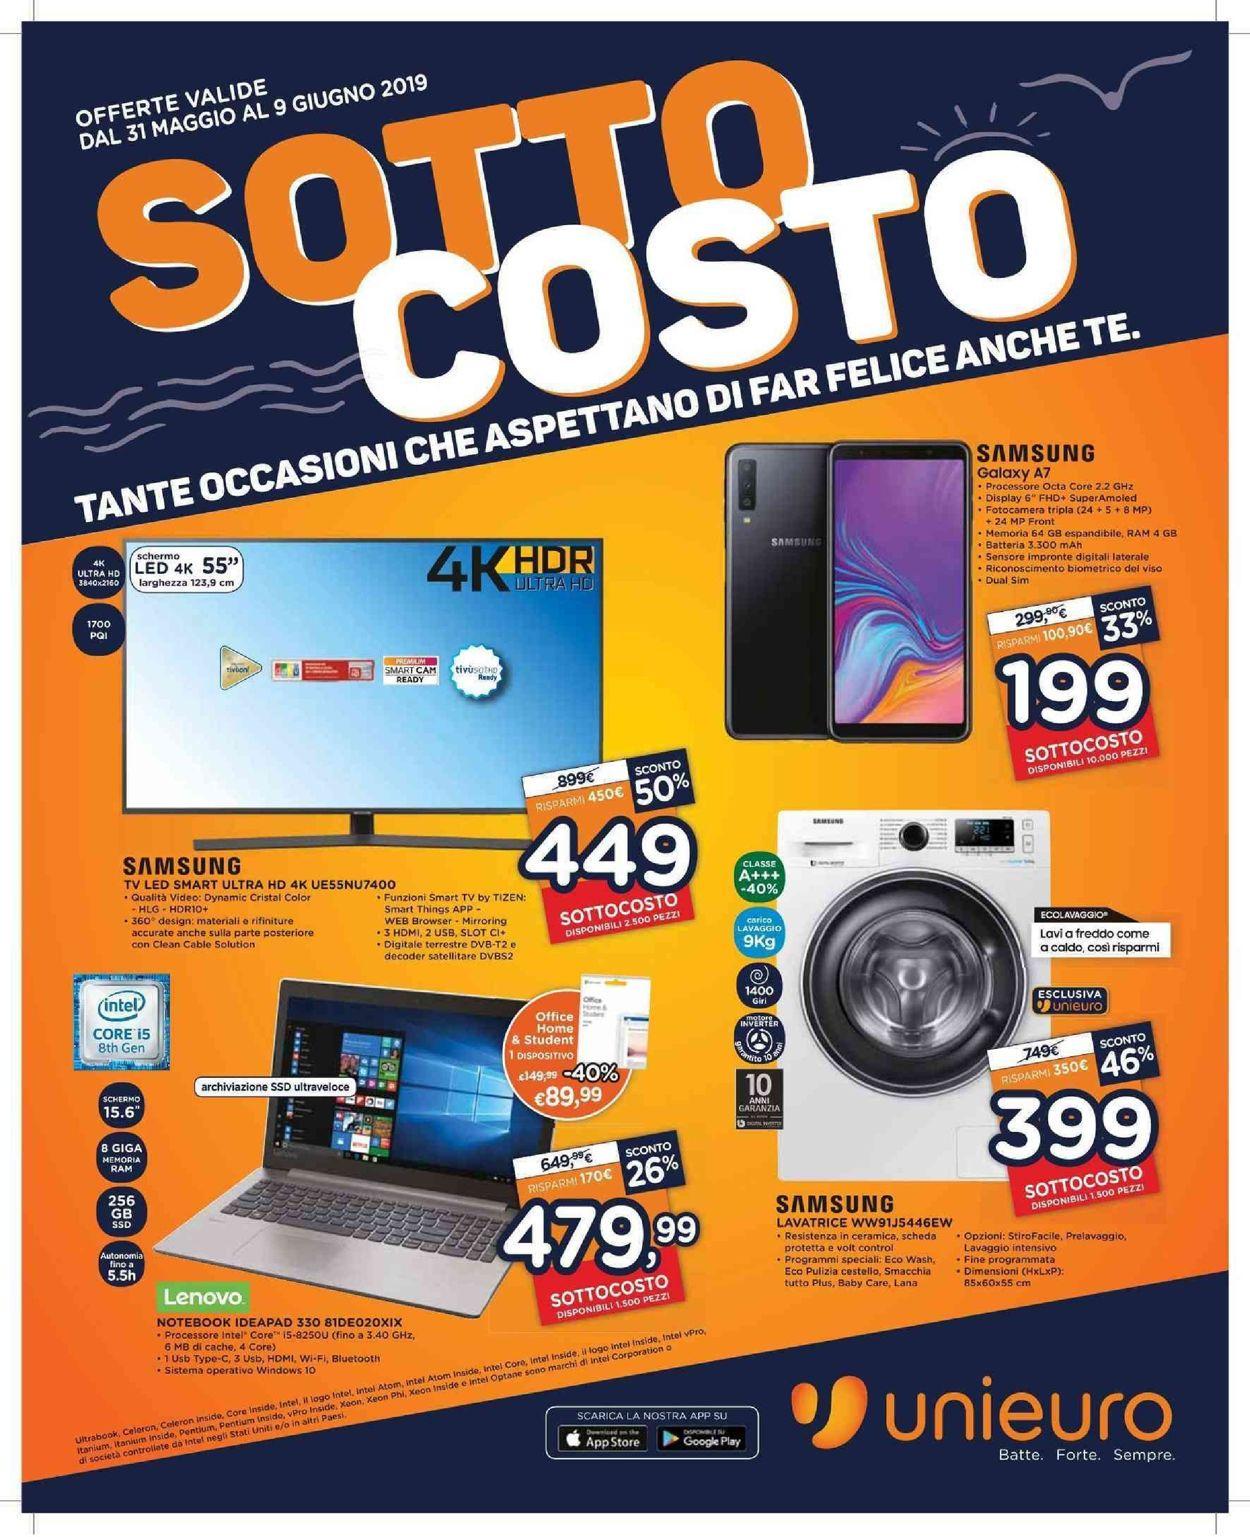 Volantino Unieuro - Offerte 31/05-09/06/2019